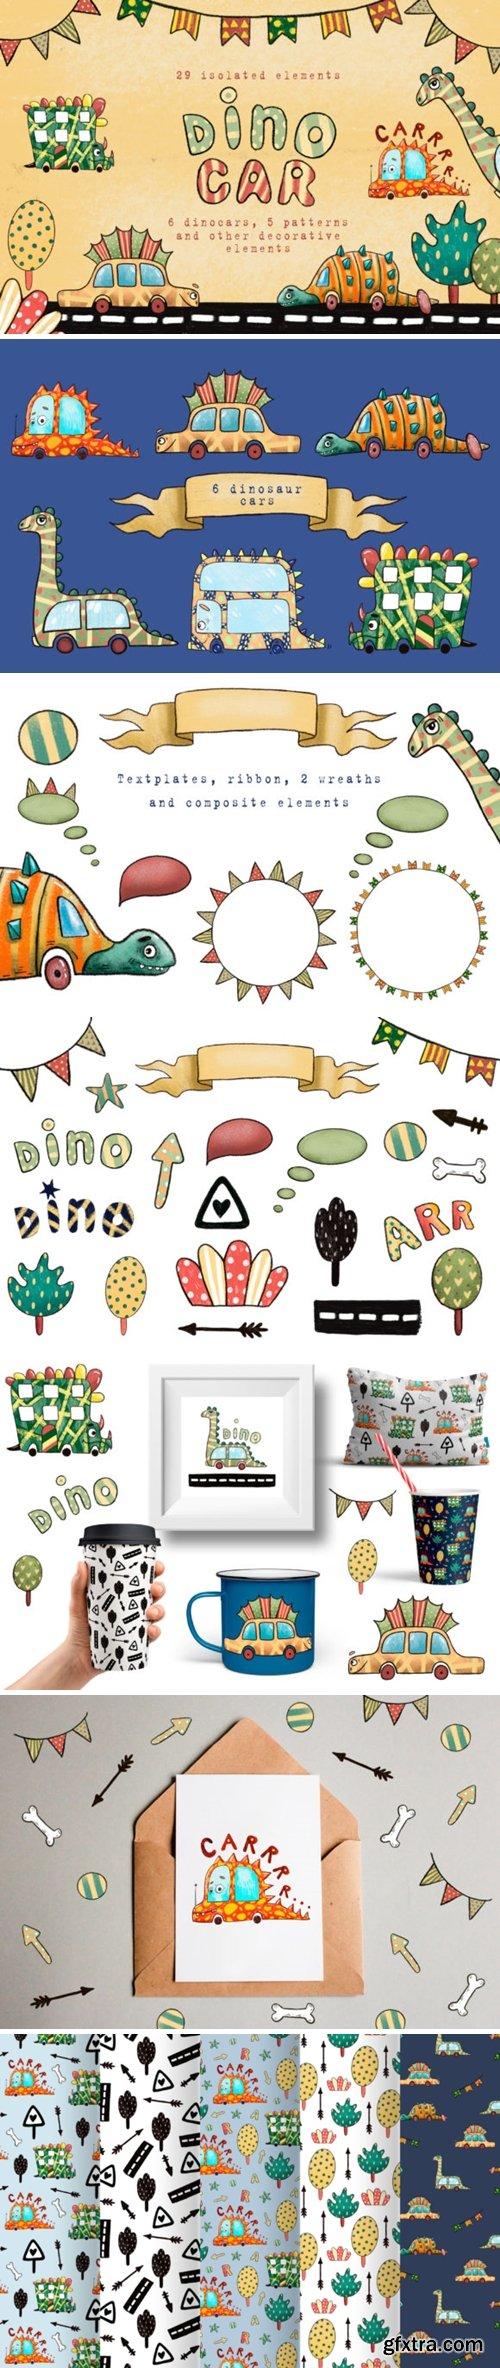 Dino Car - Clip Art Set 1465005